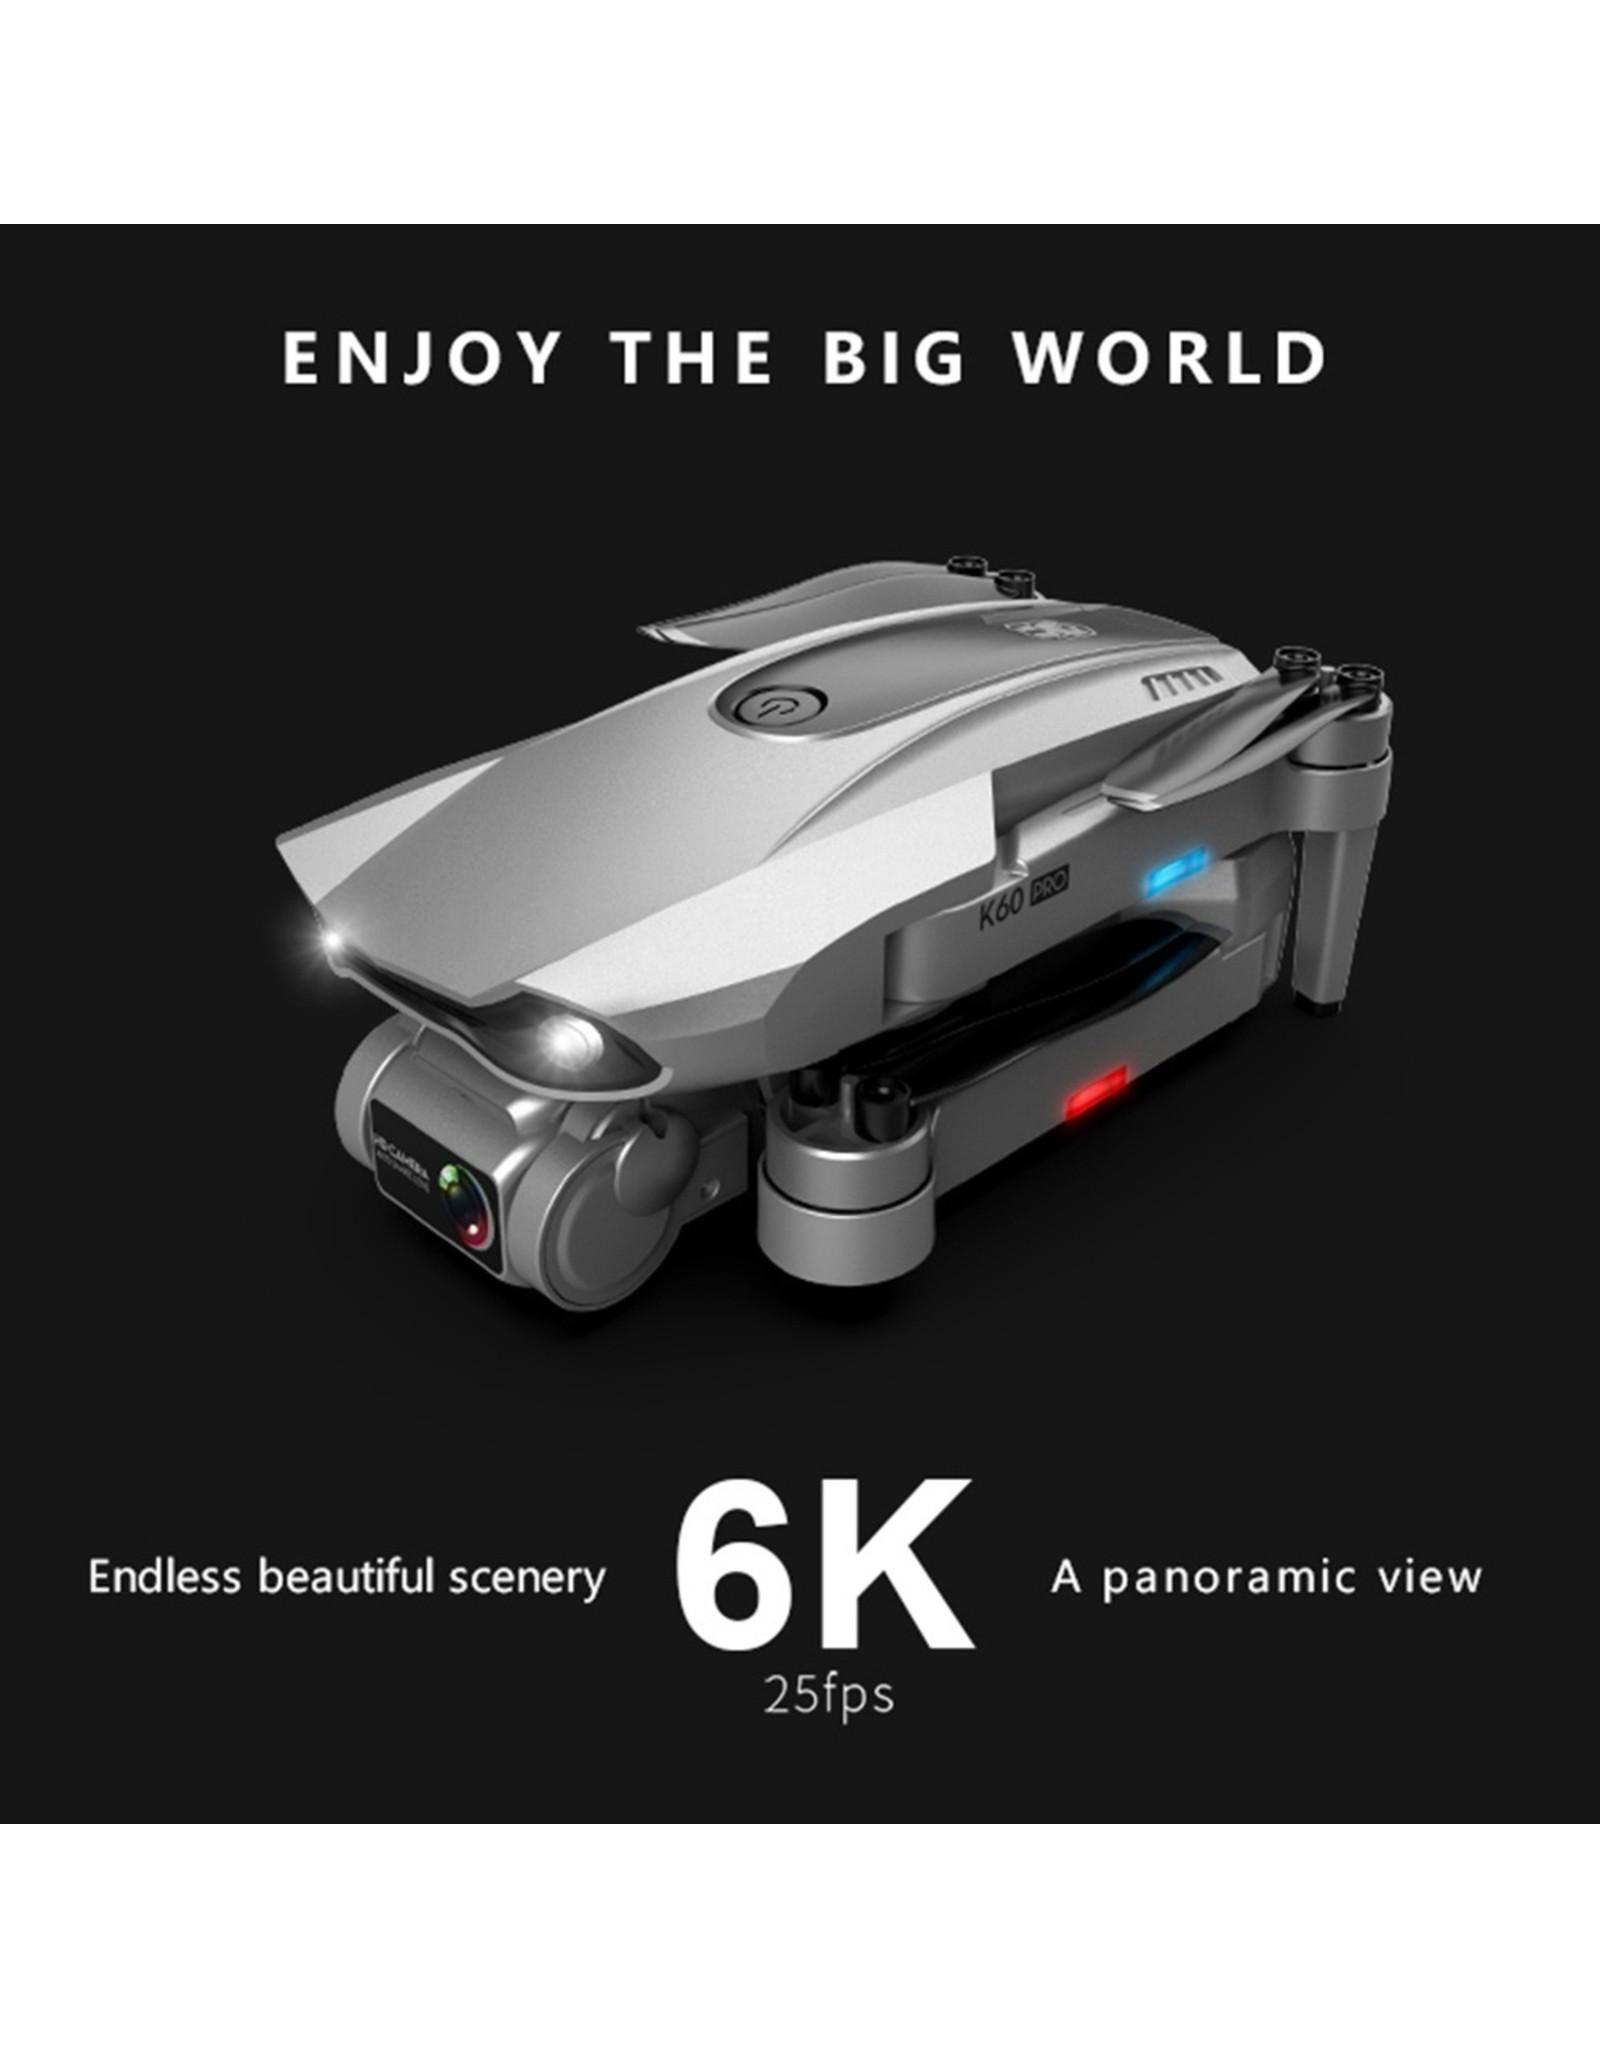 Nieuwe K60 Drone 6k HD Dual Camera Tweeassige Gimbal 5G WIFI FPV Opvouwbare RC Quadcopter Vliegen 25 minuten Drone 4k Professionele